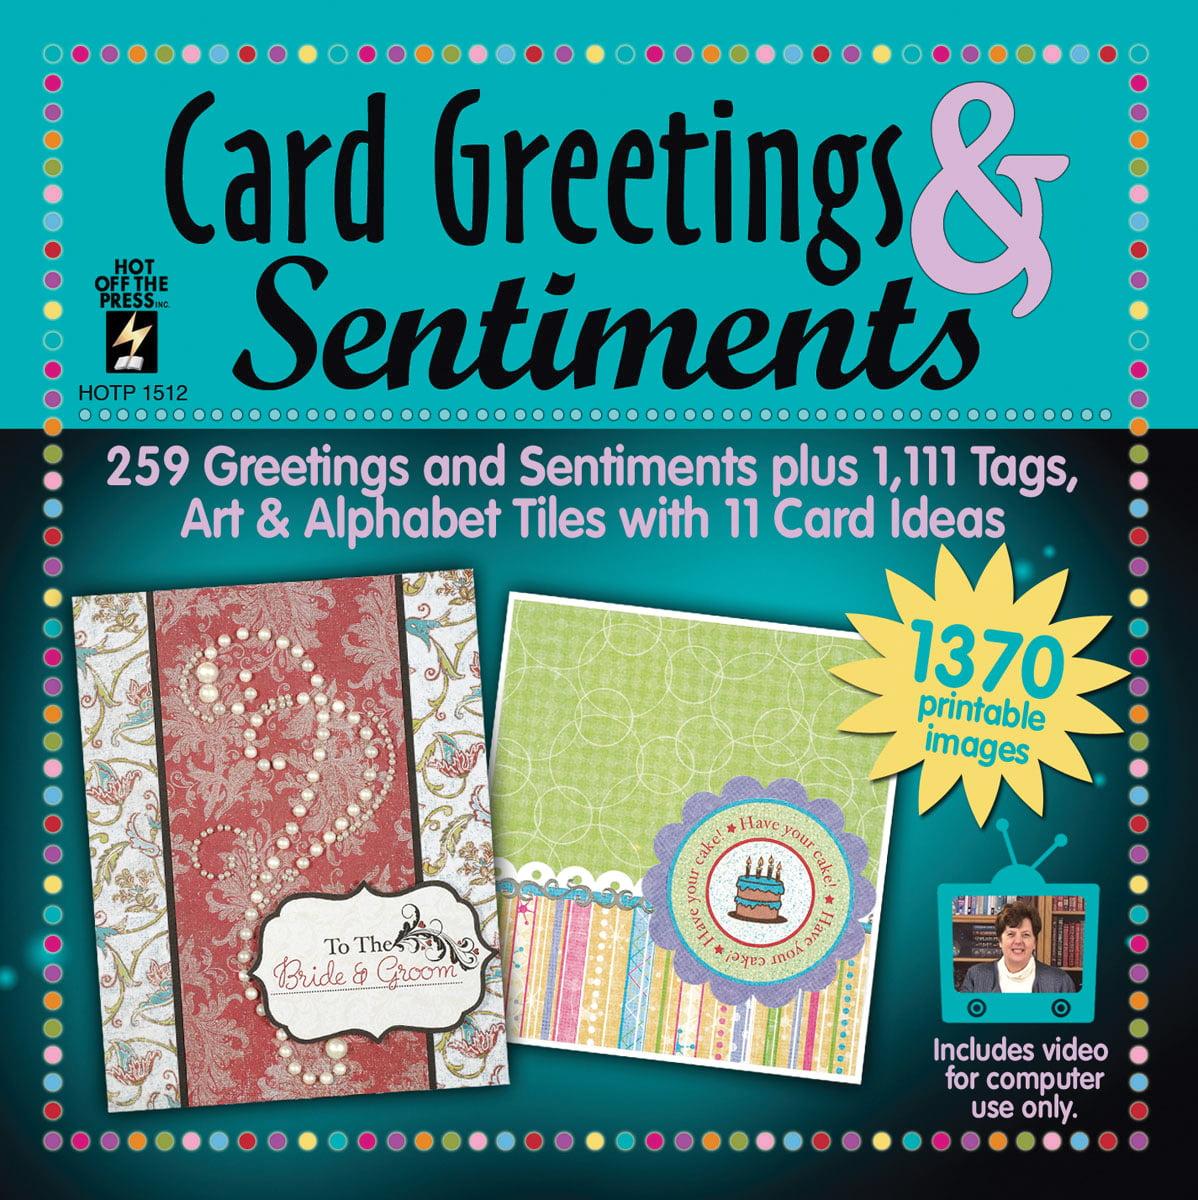 Card Greetings & Sentiments CD-